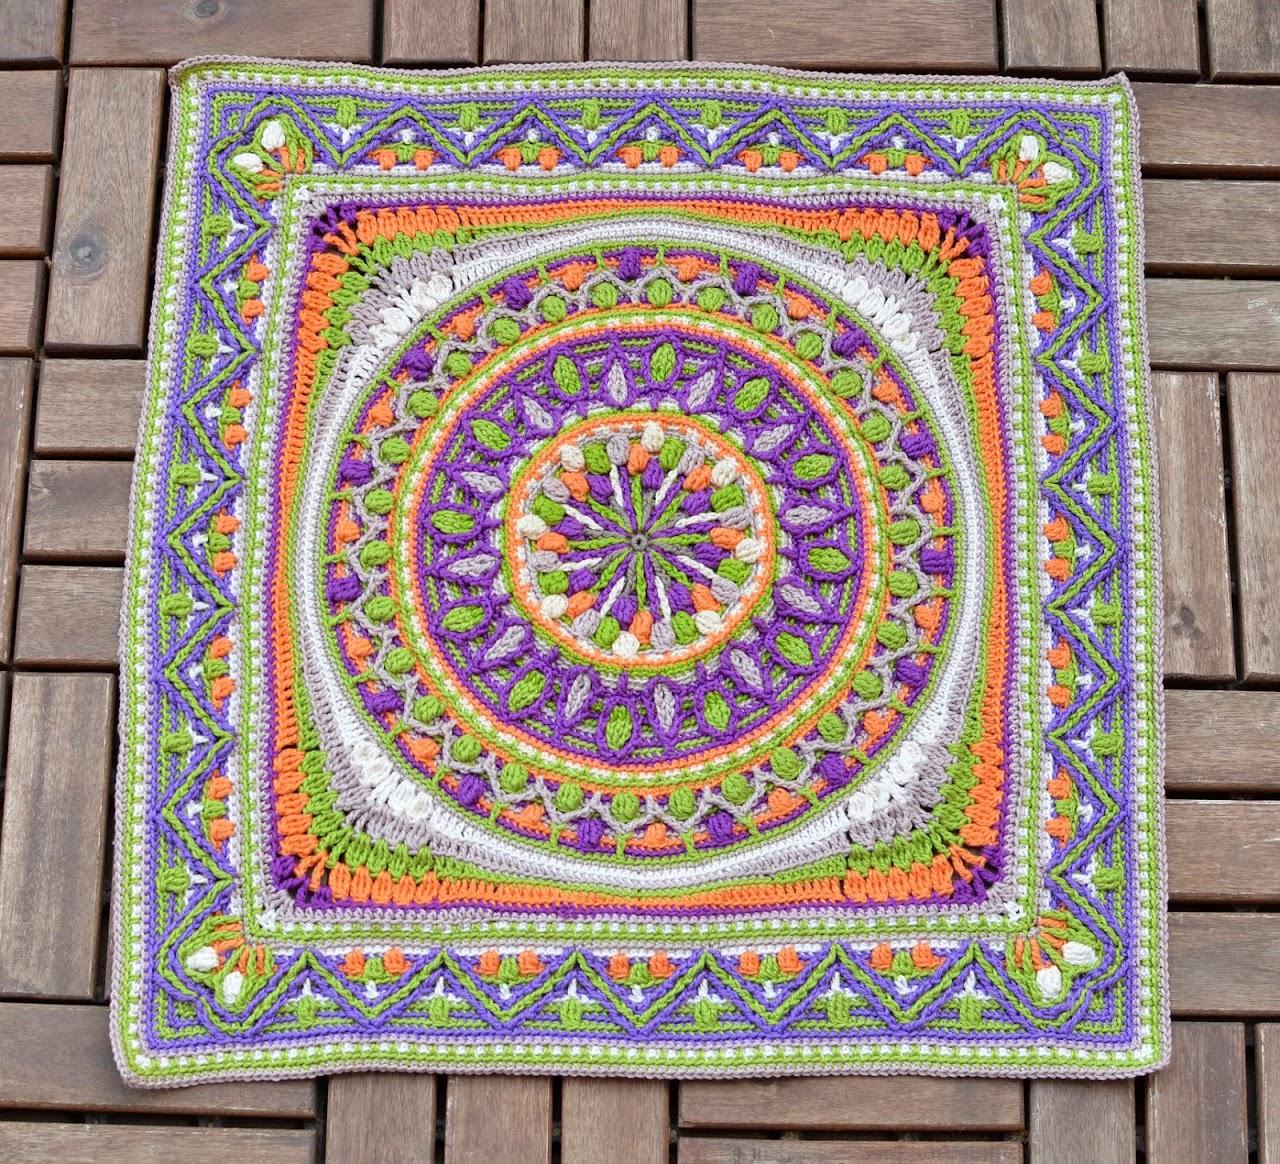 Square edge for a crochet mandala